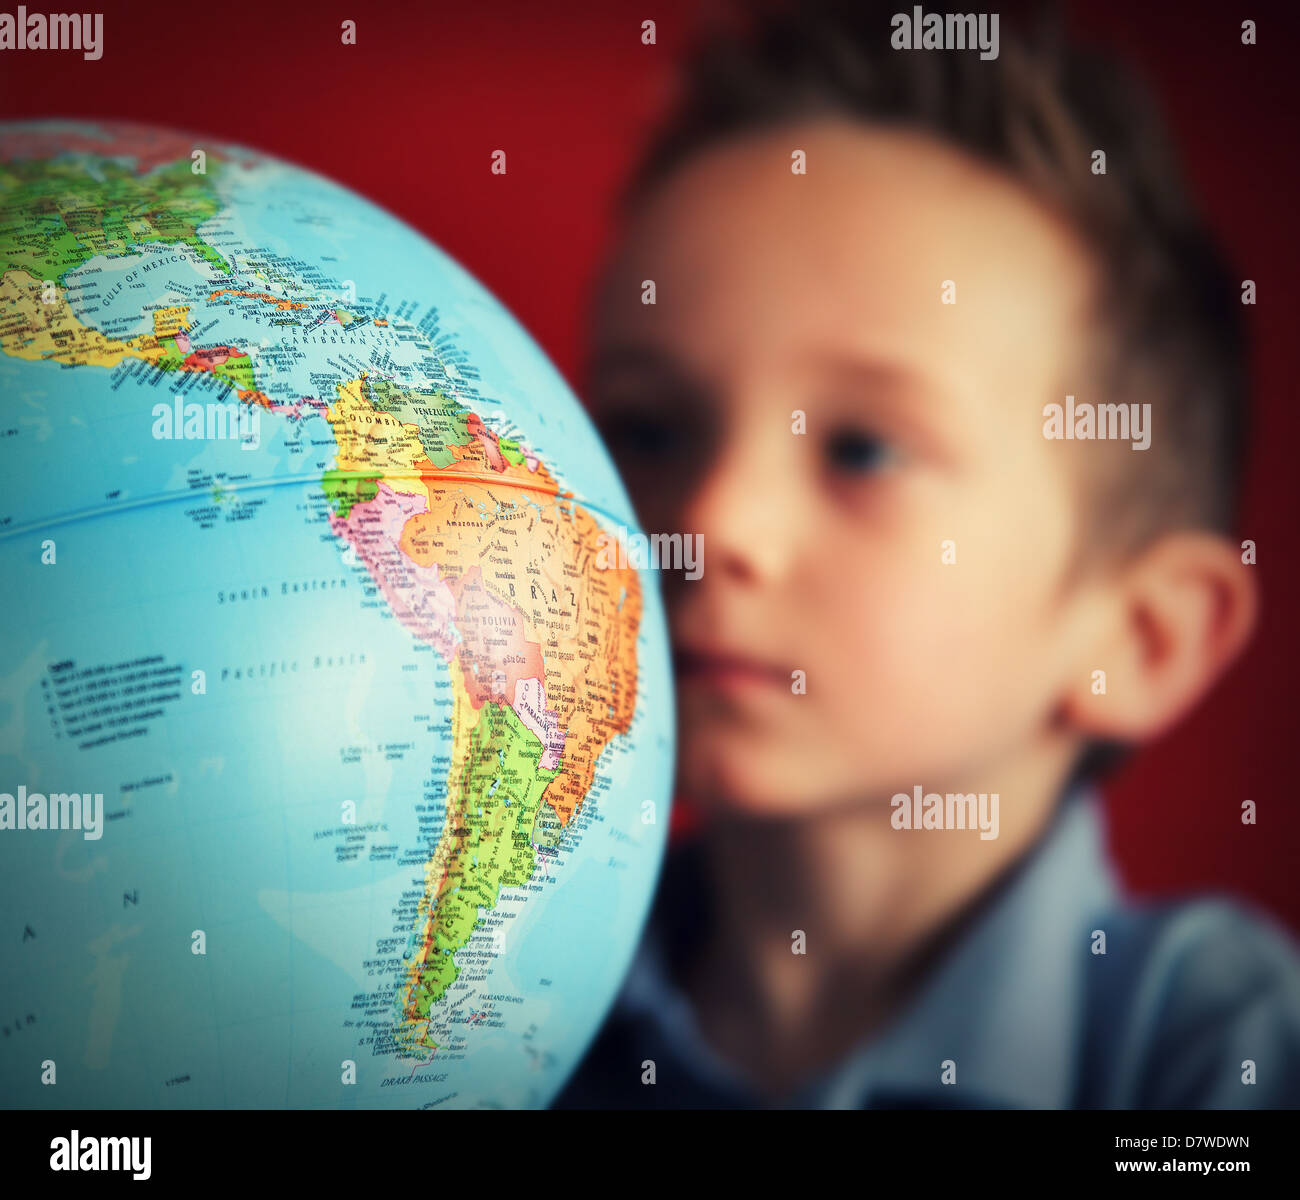 School boy looking at globe Photo Stock